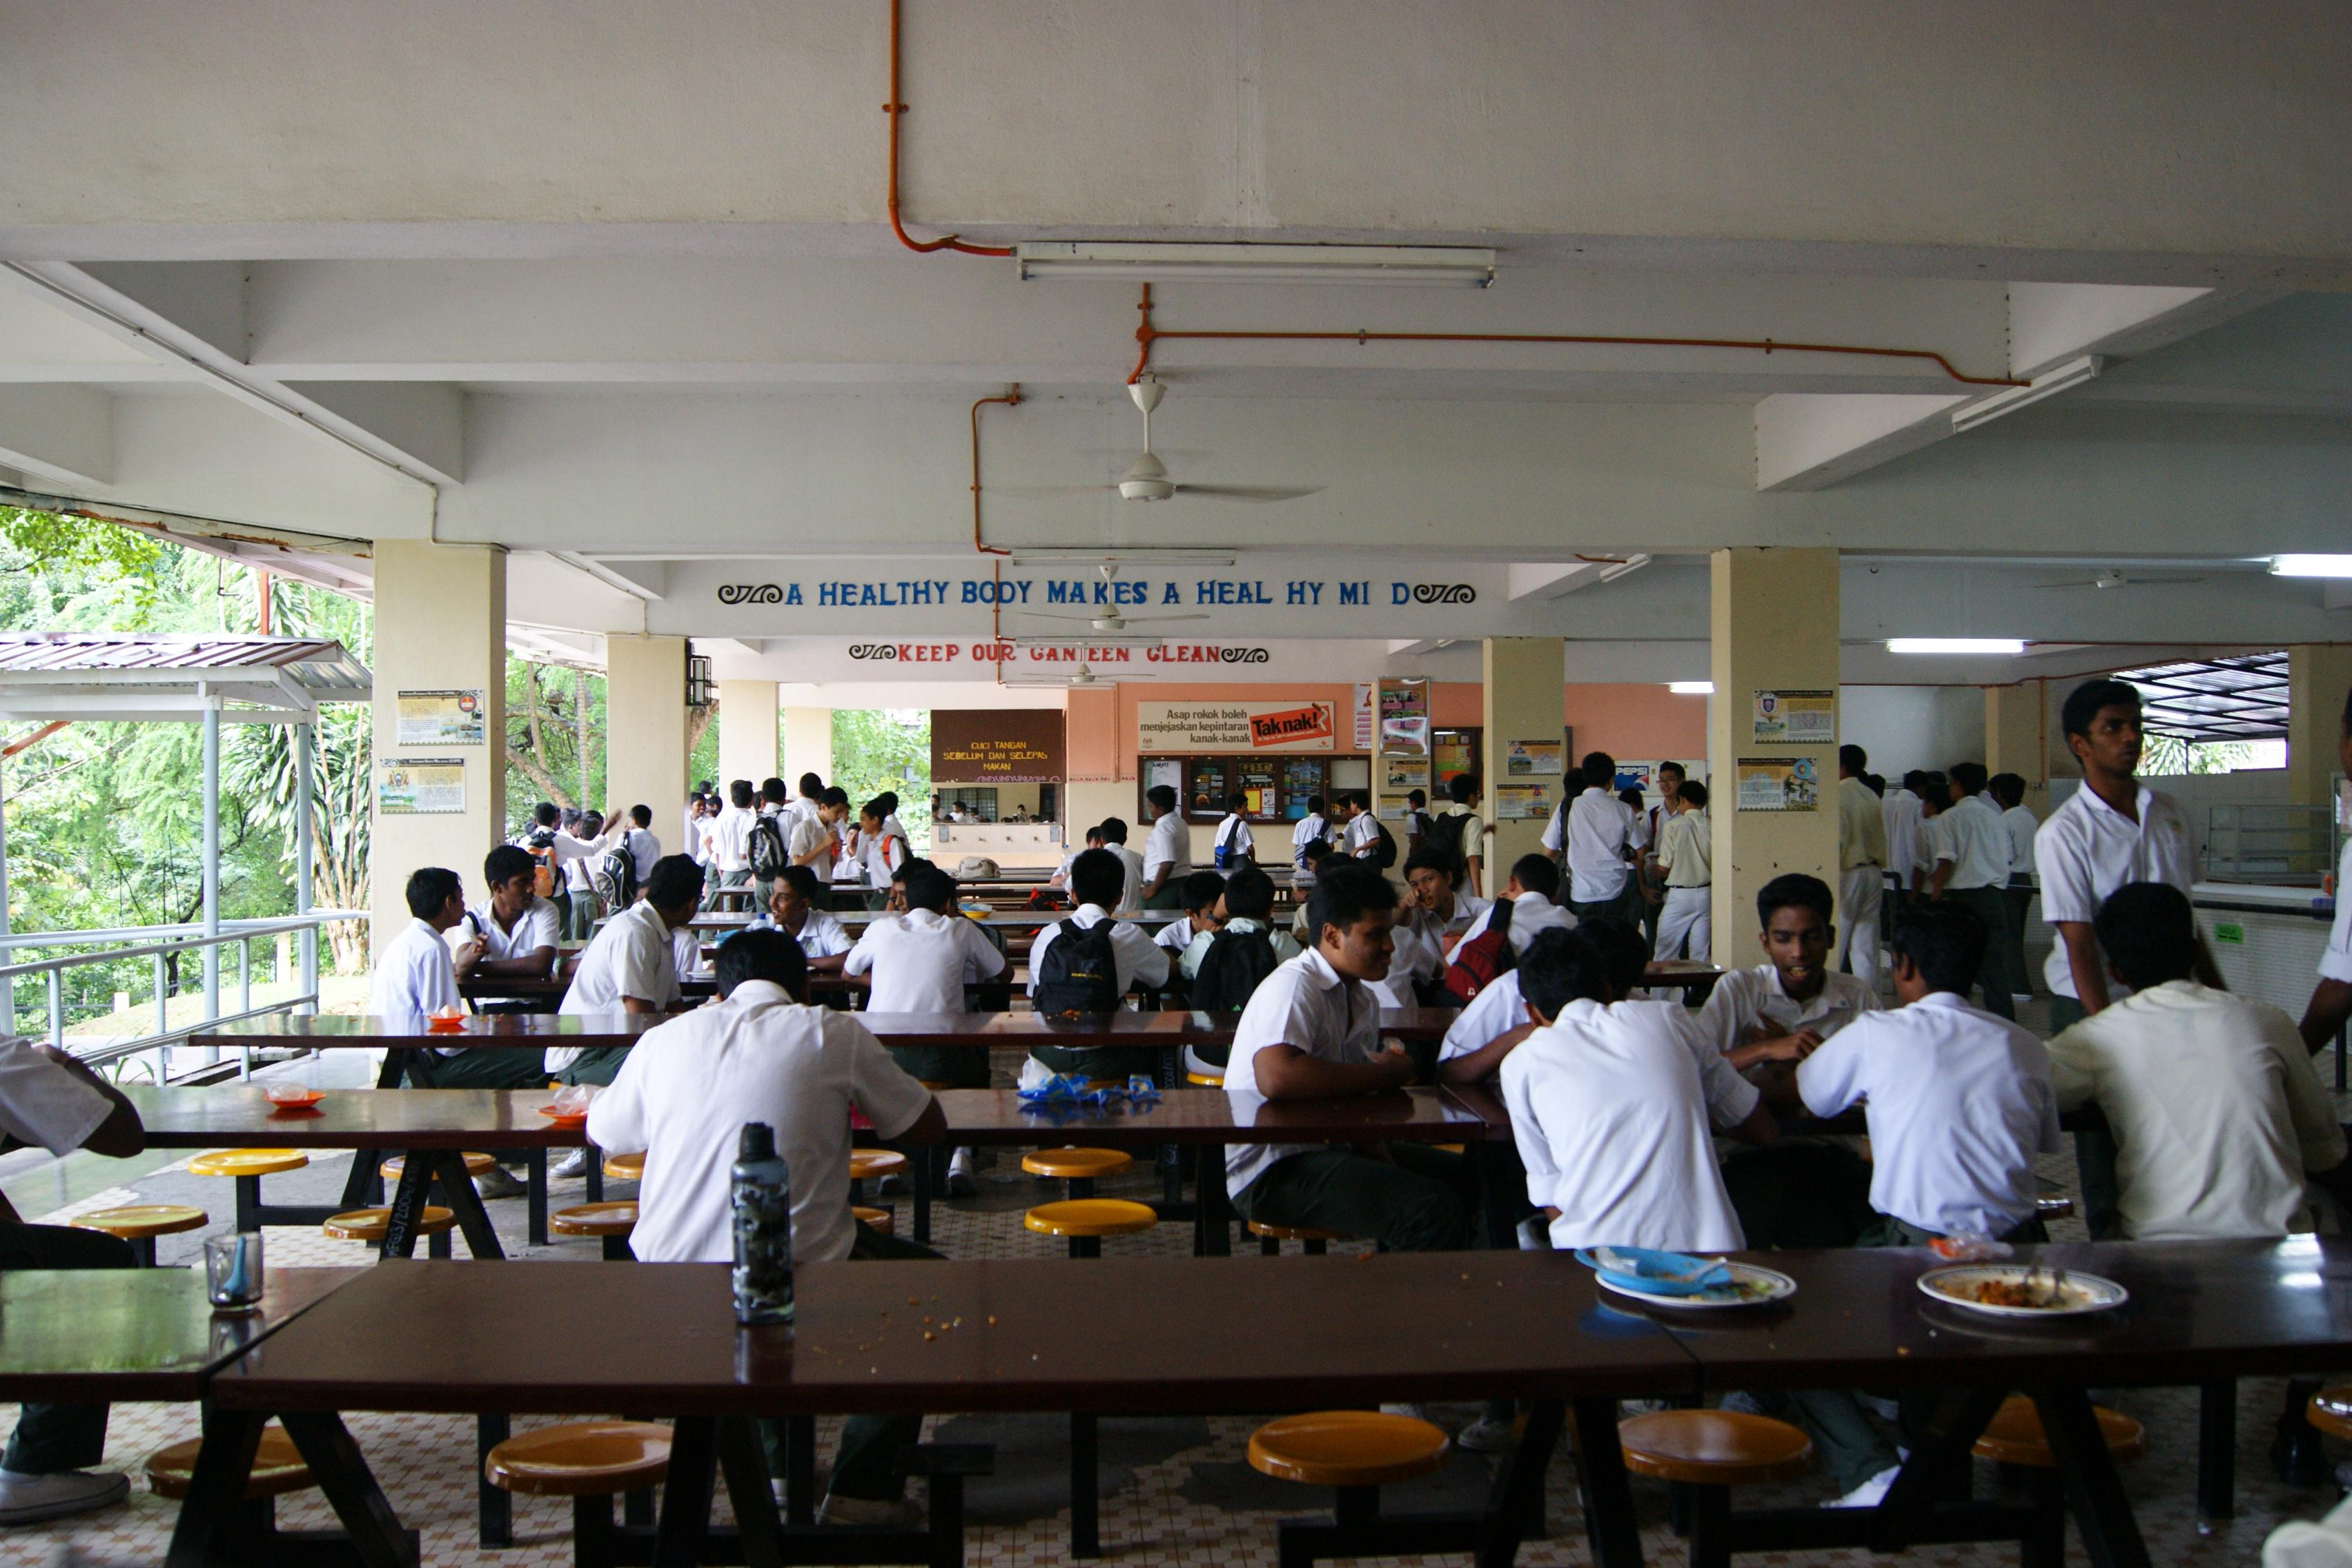 English: Canteen - Last days of school